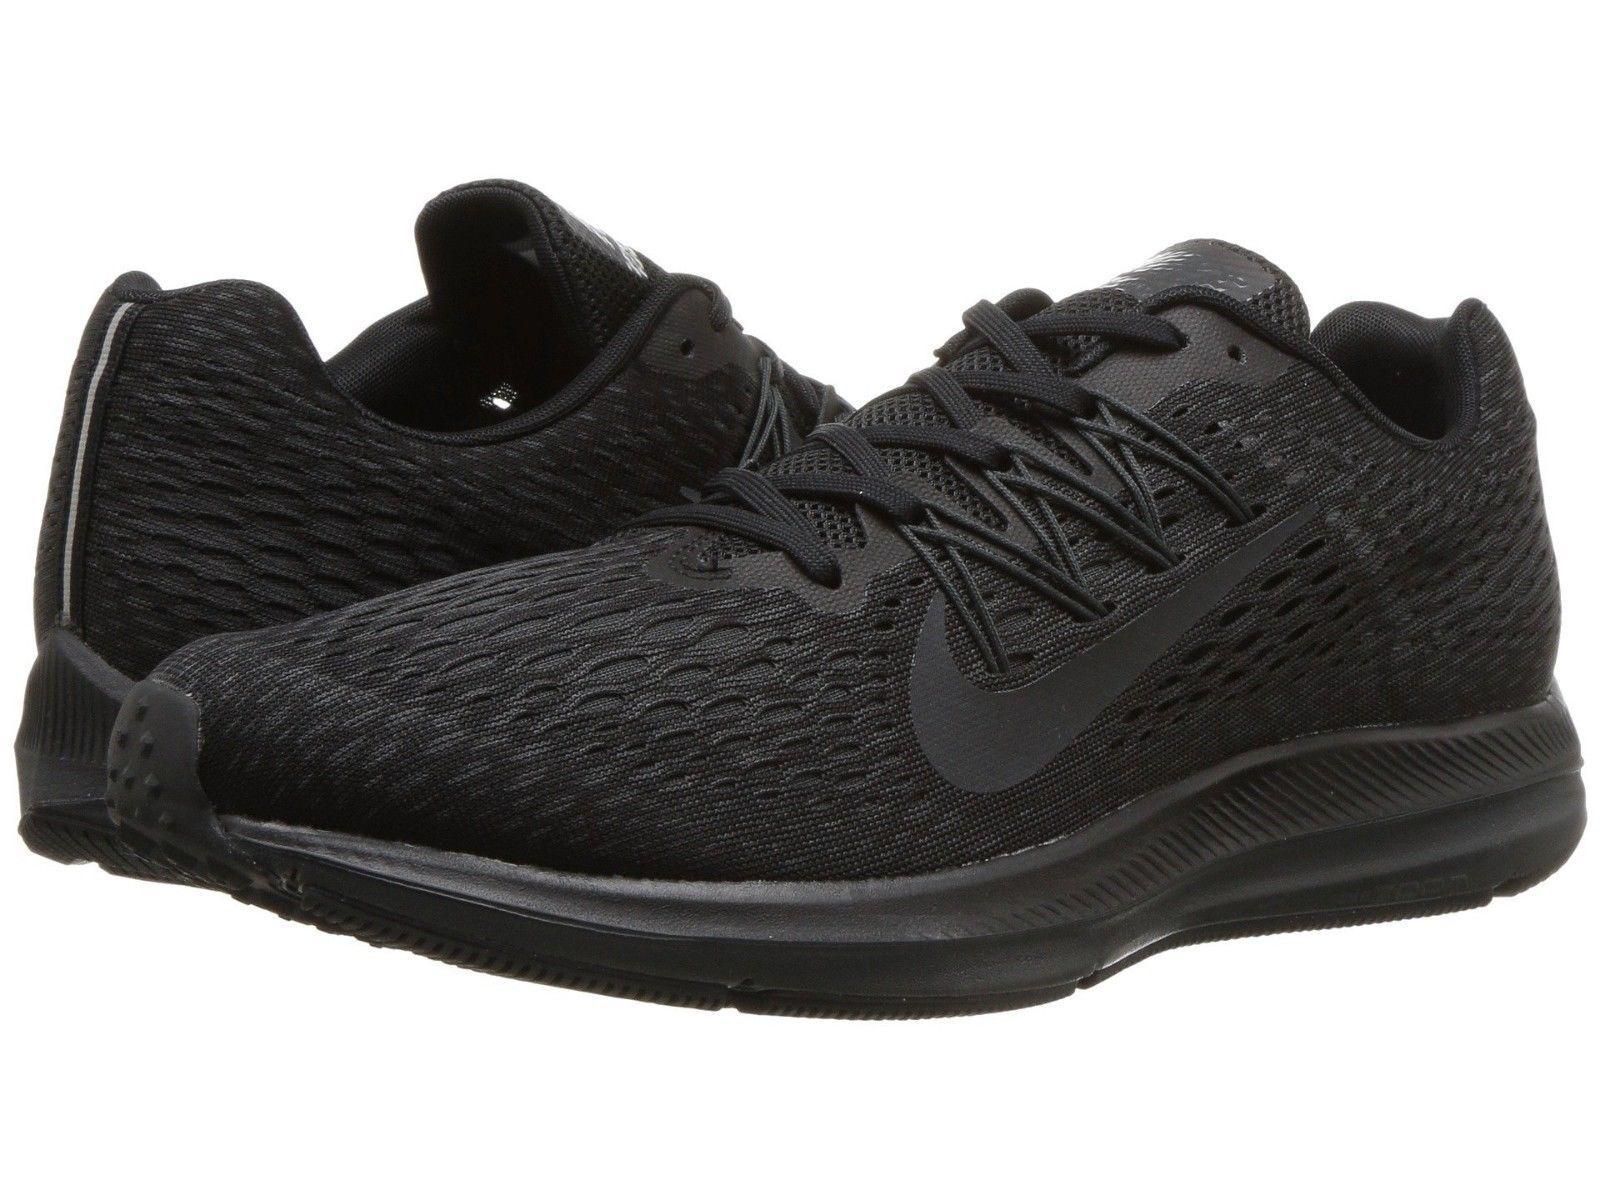 Men's Nike Air Zoom Winflo 5 Running Black/Anthracite Sizes 8-12 NIB AA7406-002